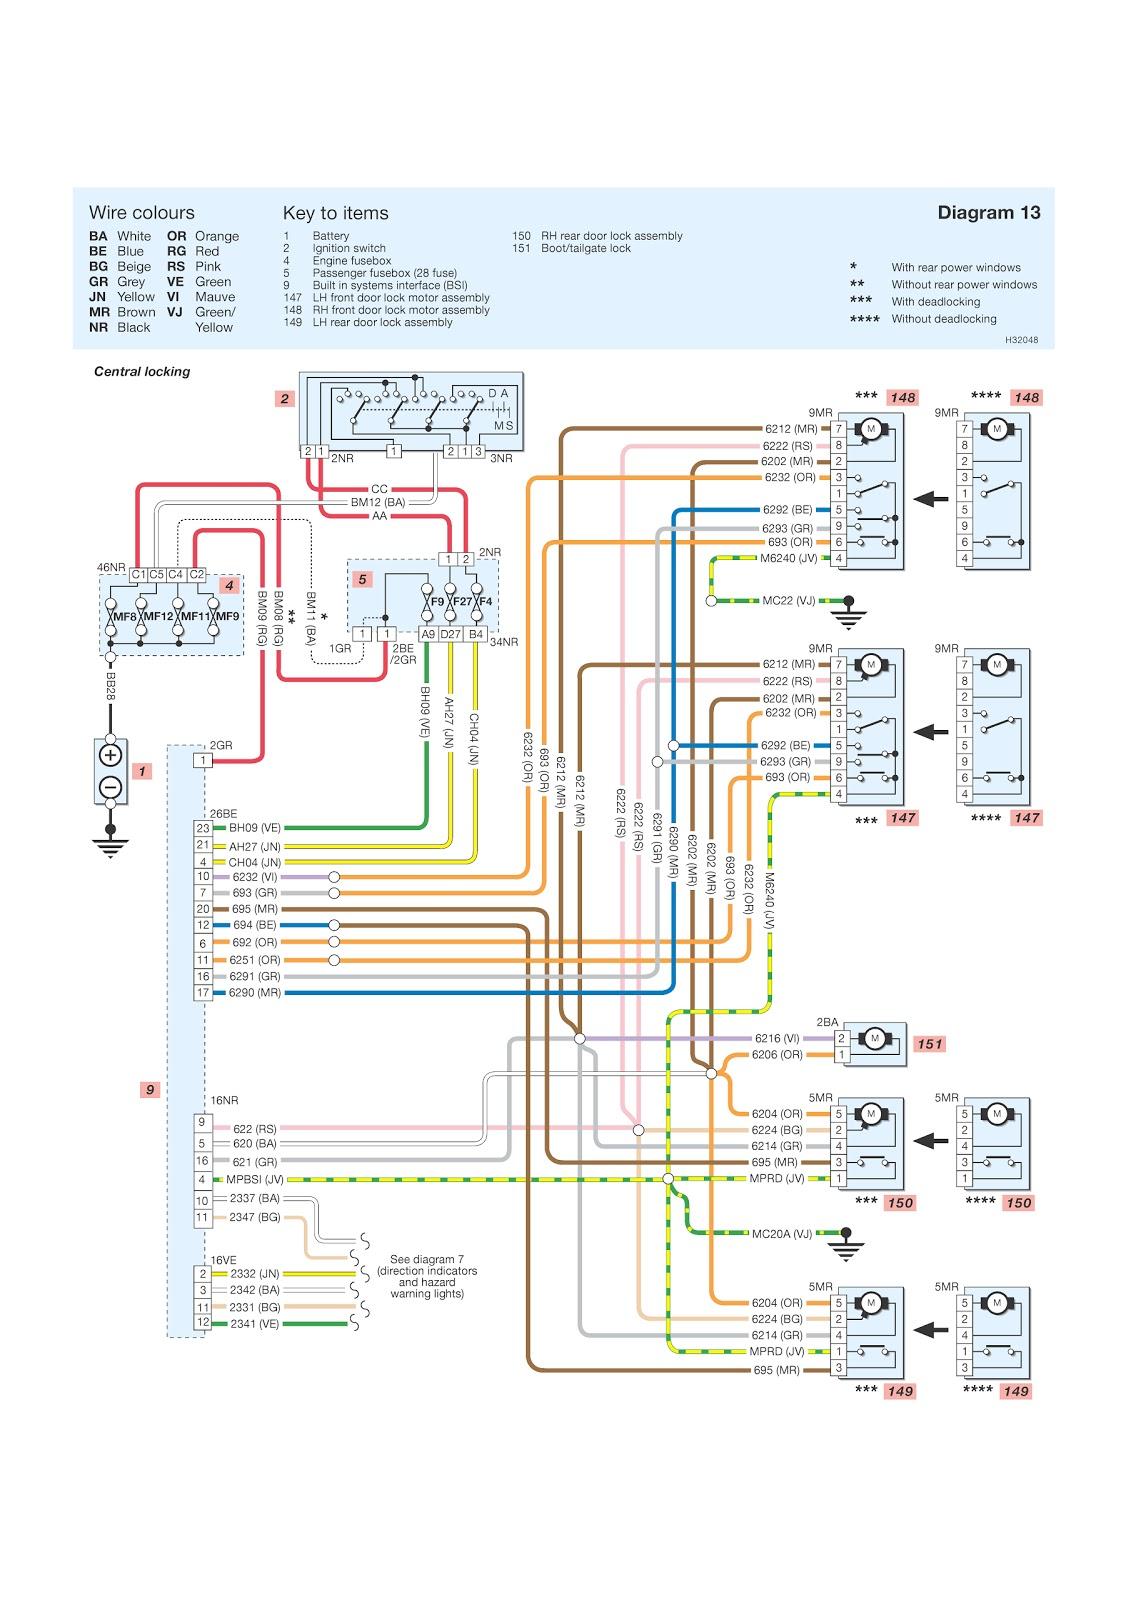 Peugeot 206 Kfw Wiring Diagram | Wiring Diagram on